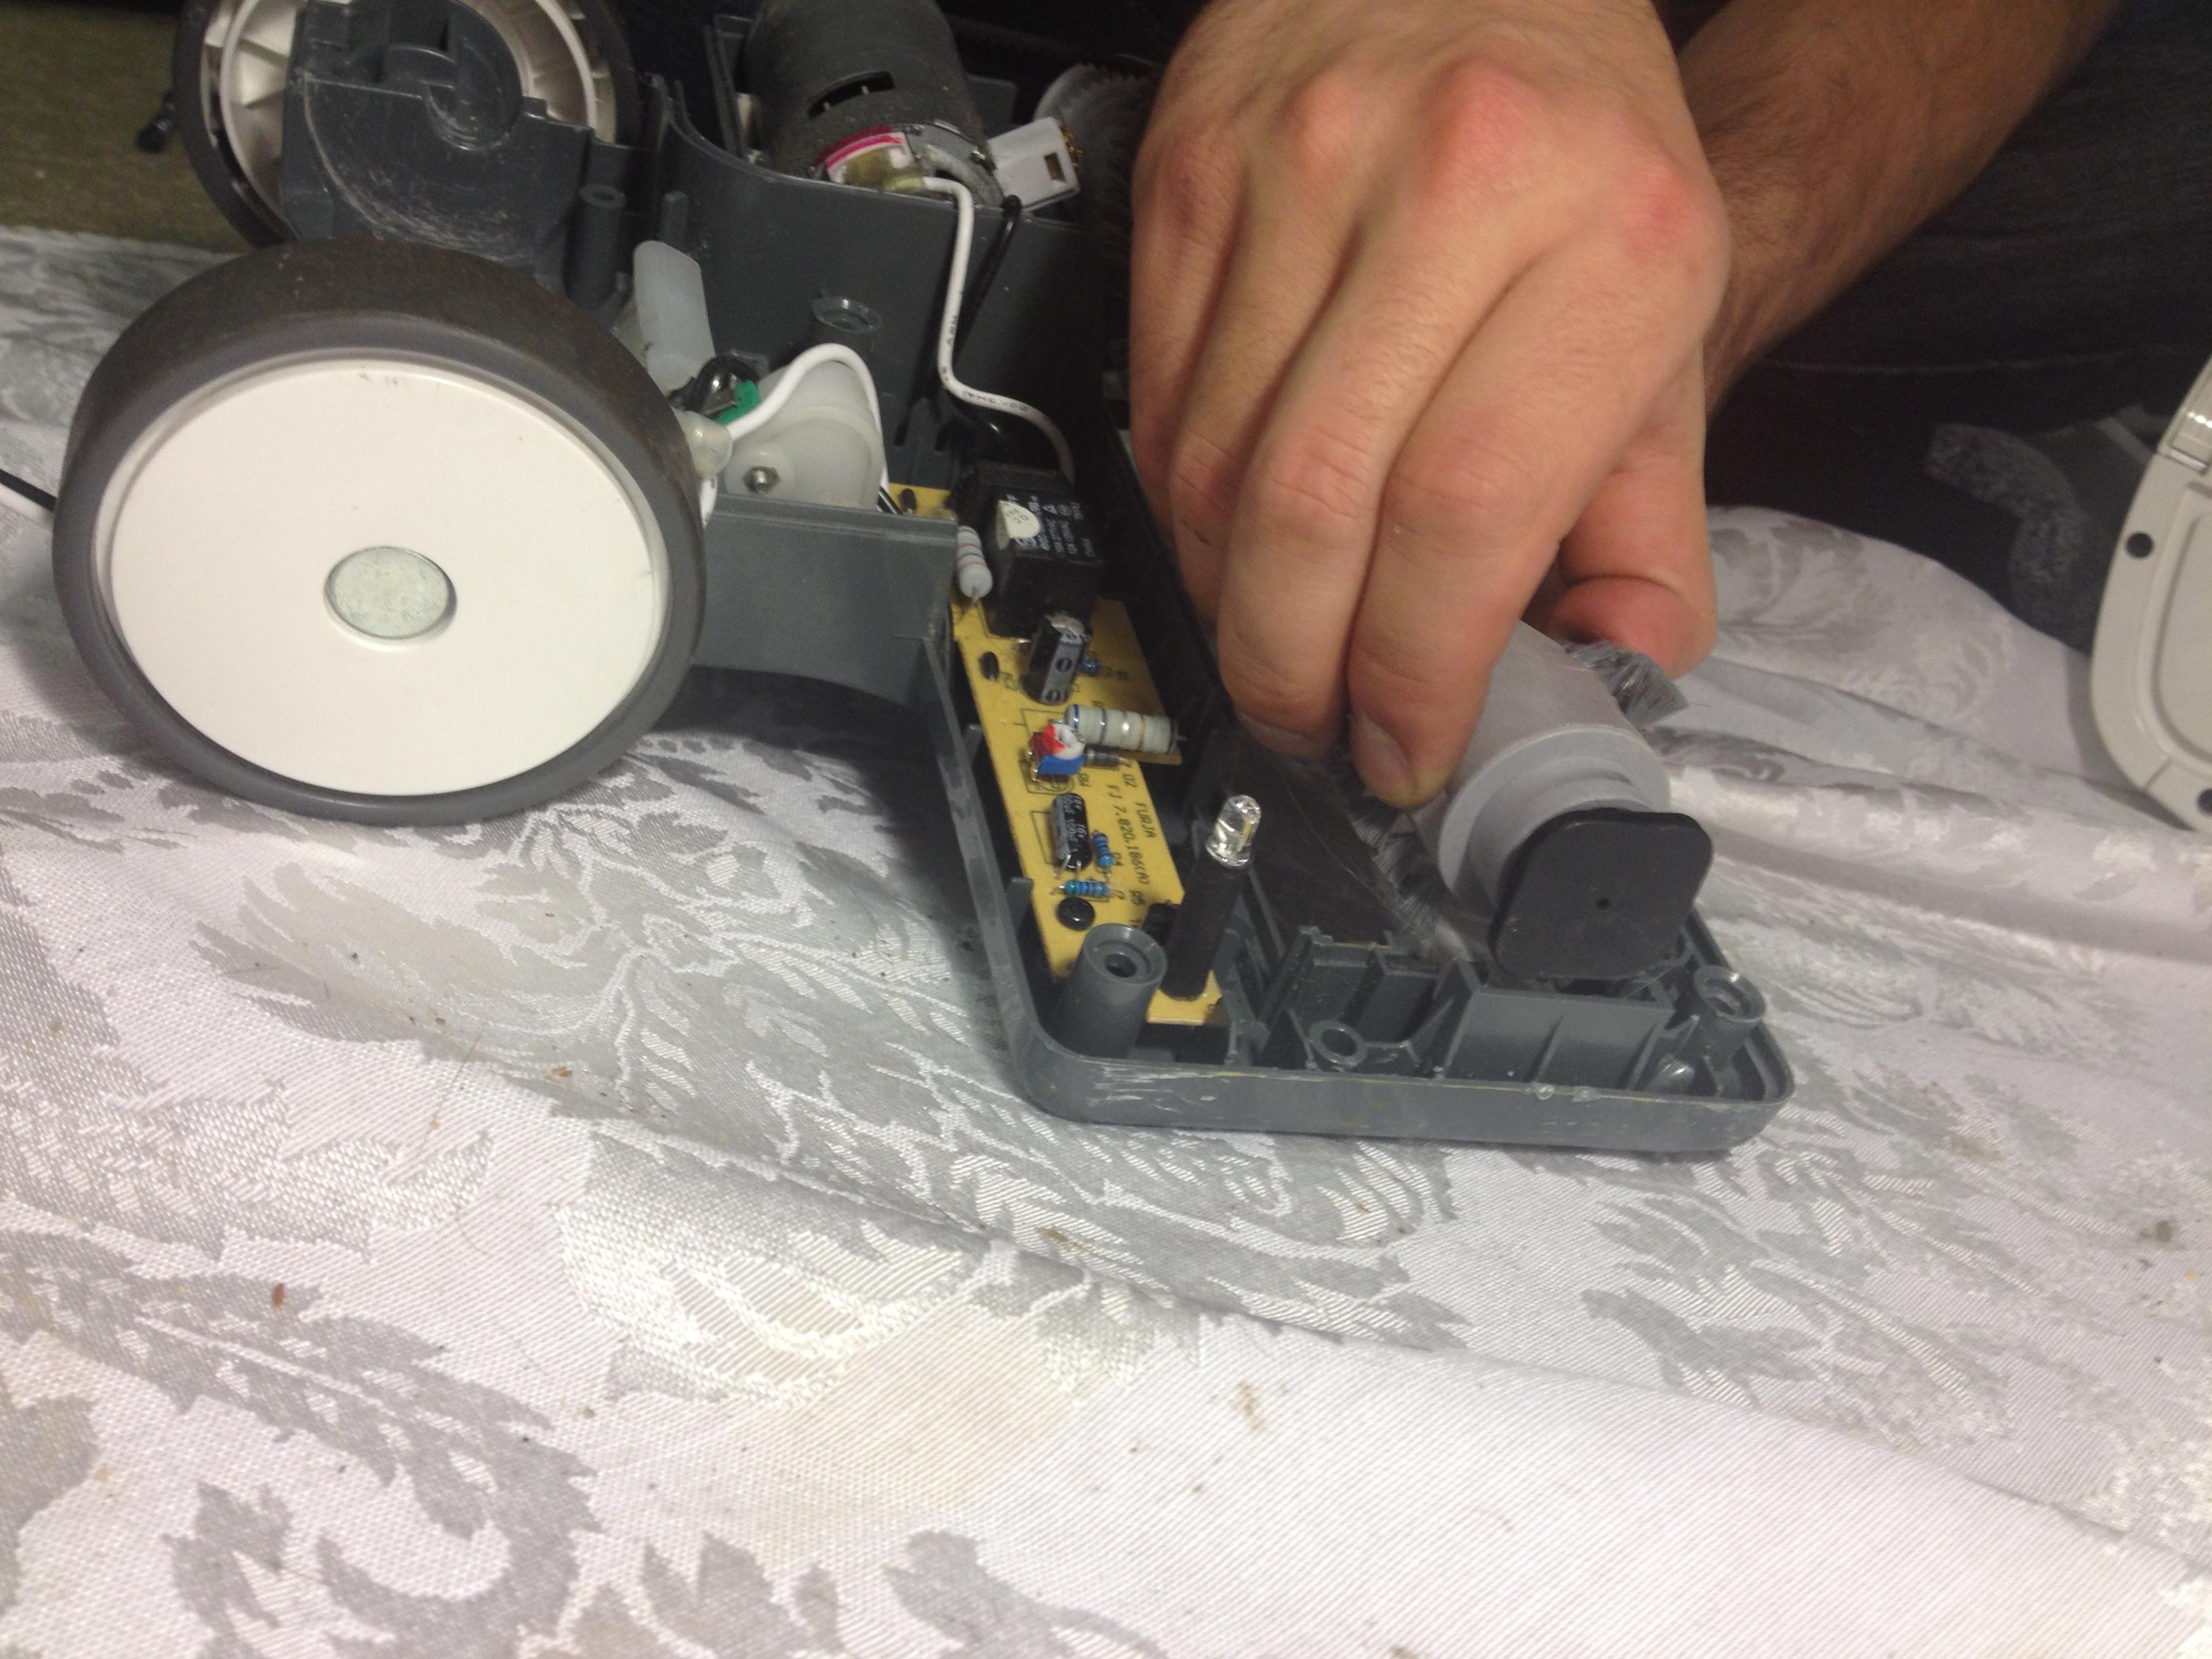 shark navigator roller brush replacement ifixit repair guide. Black Bedroom Furniture Sets. Home Design Ideas